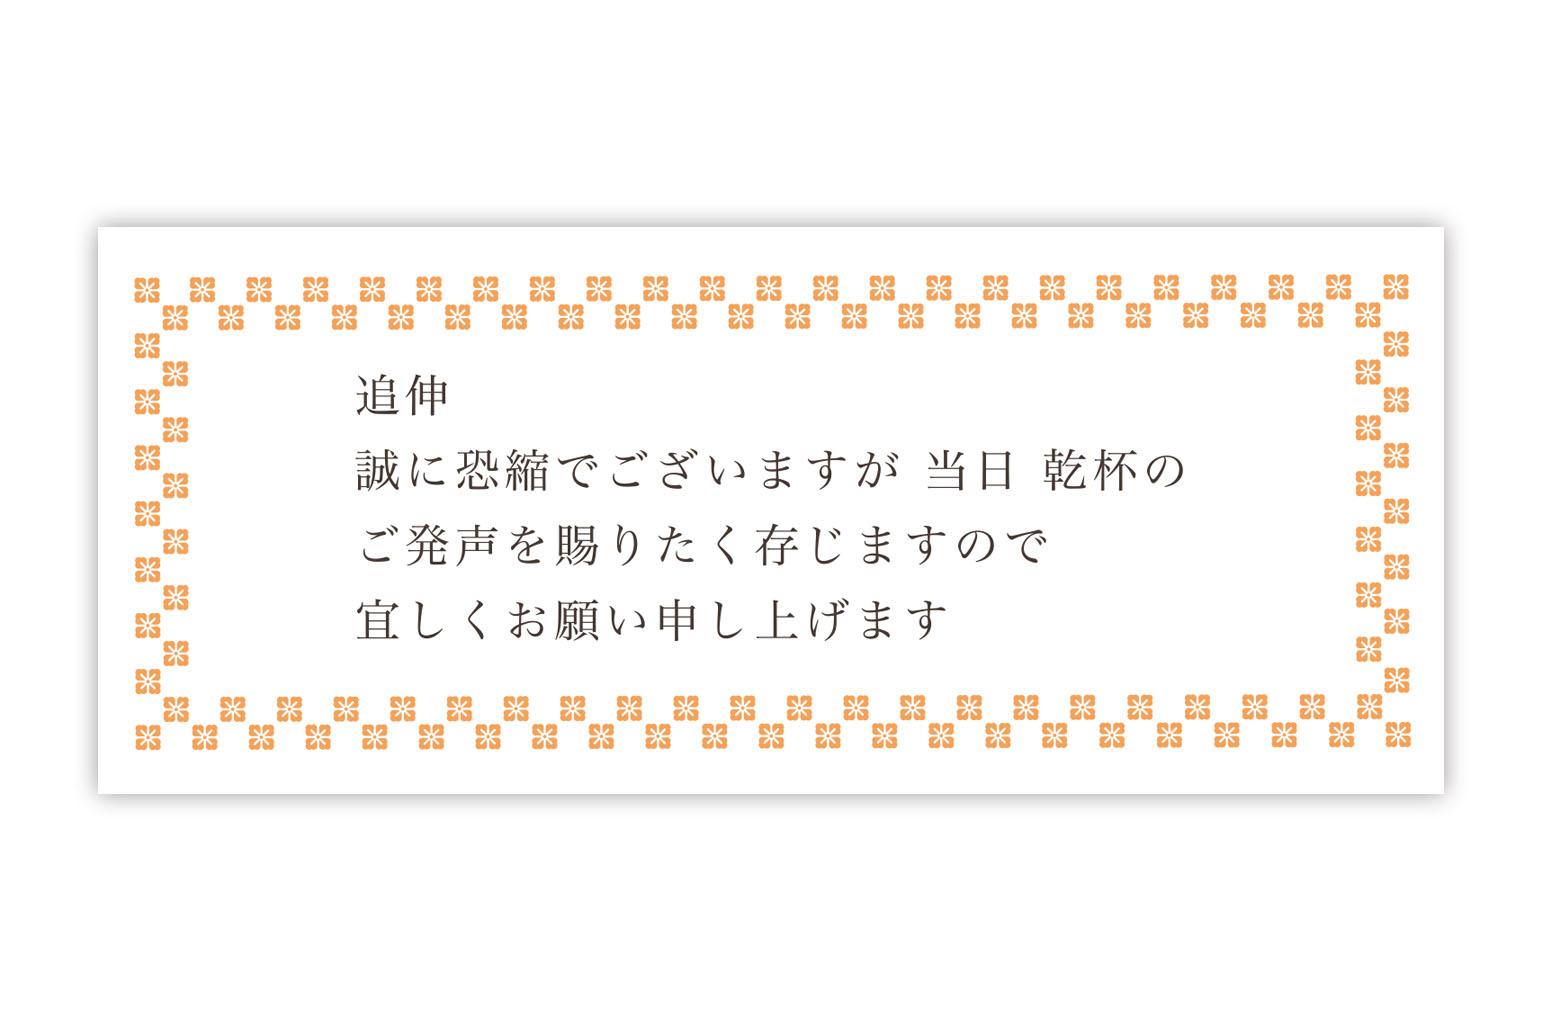 Tagged Messages: MESSAGE TAG Orange乾杯依頼付箋 和(オレンジ)/ウェディングアイテム/付箋・オプション- 結婚式